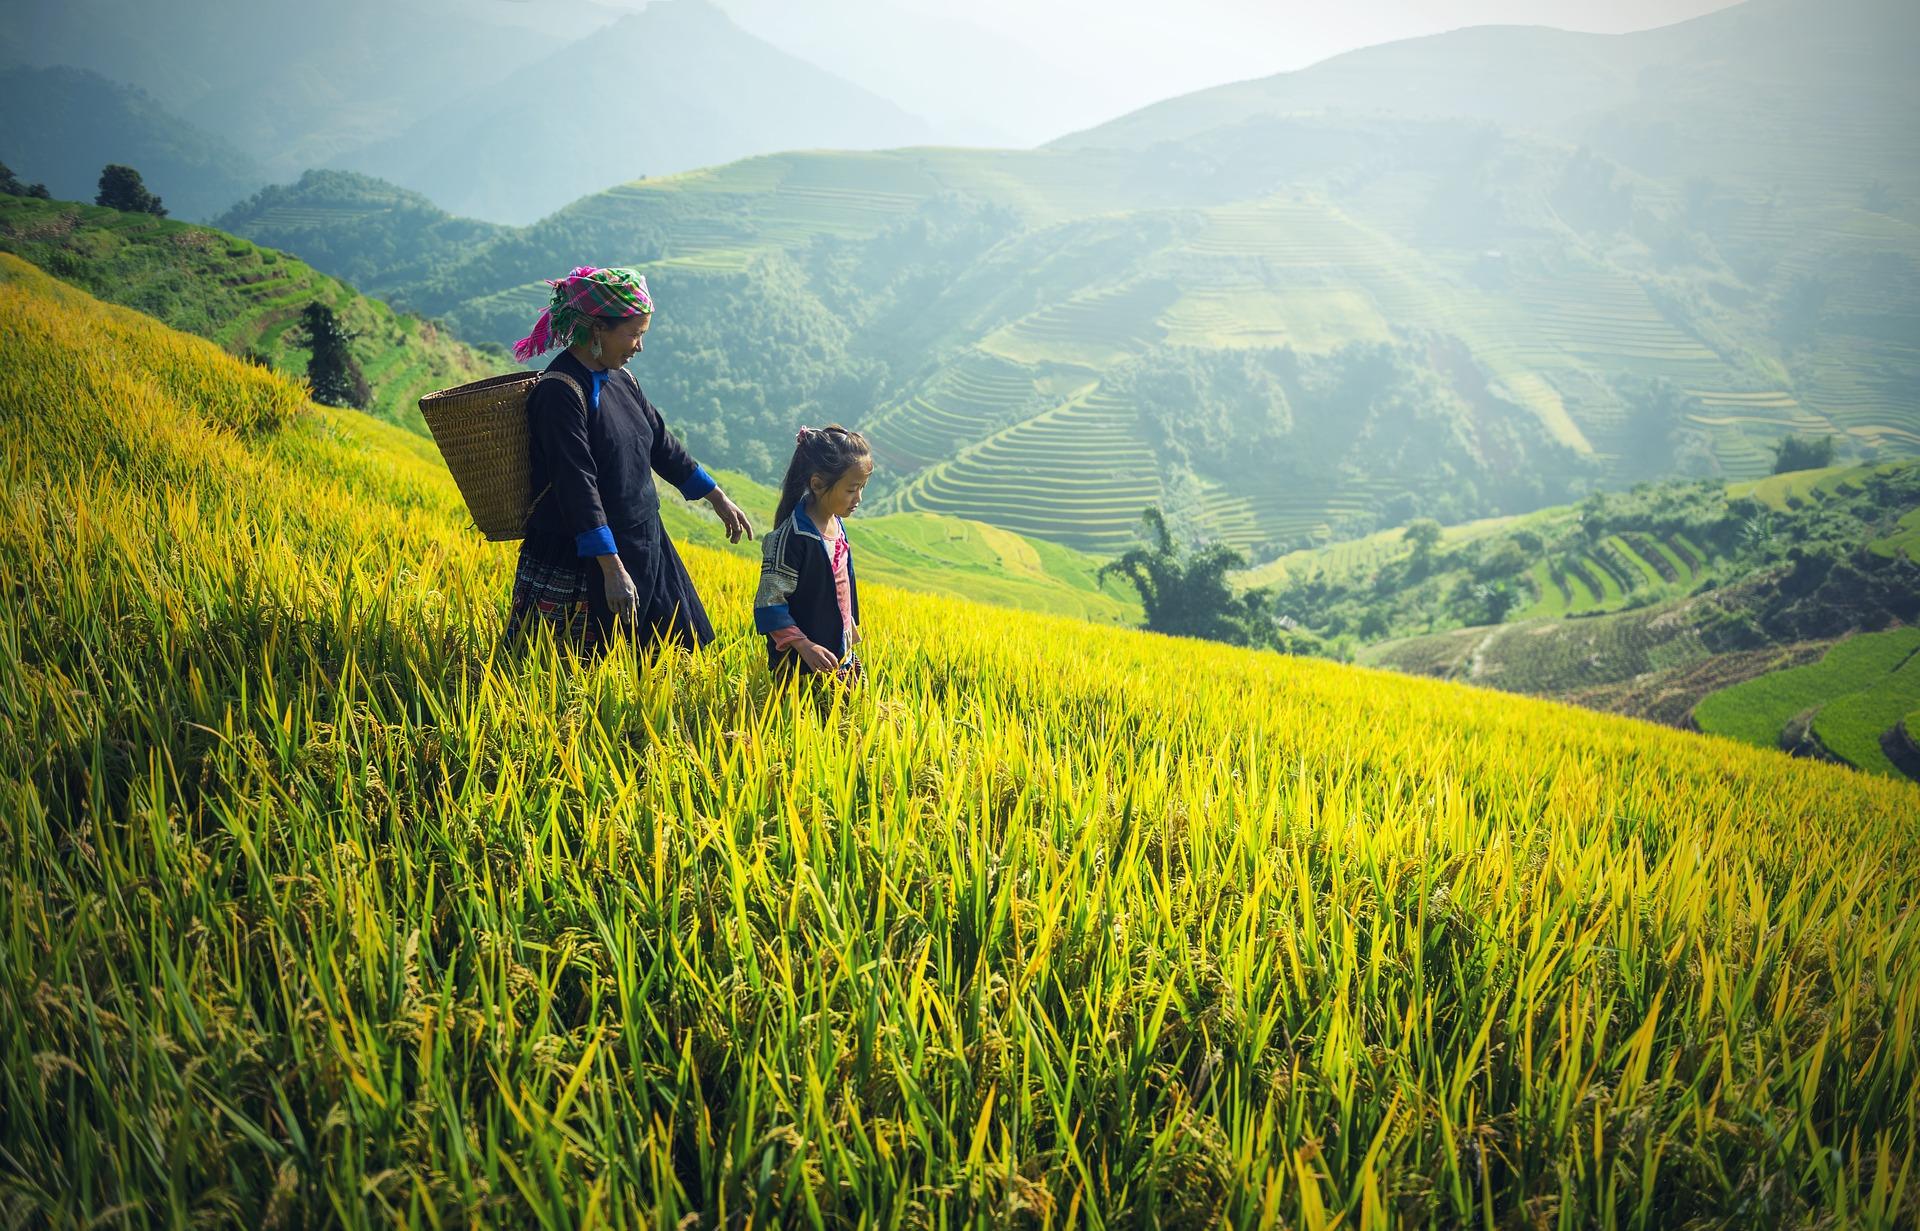 Vietnam with John Quintero